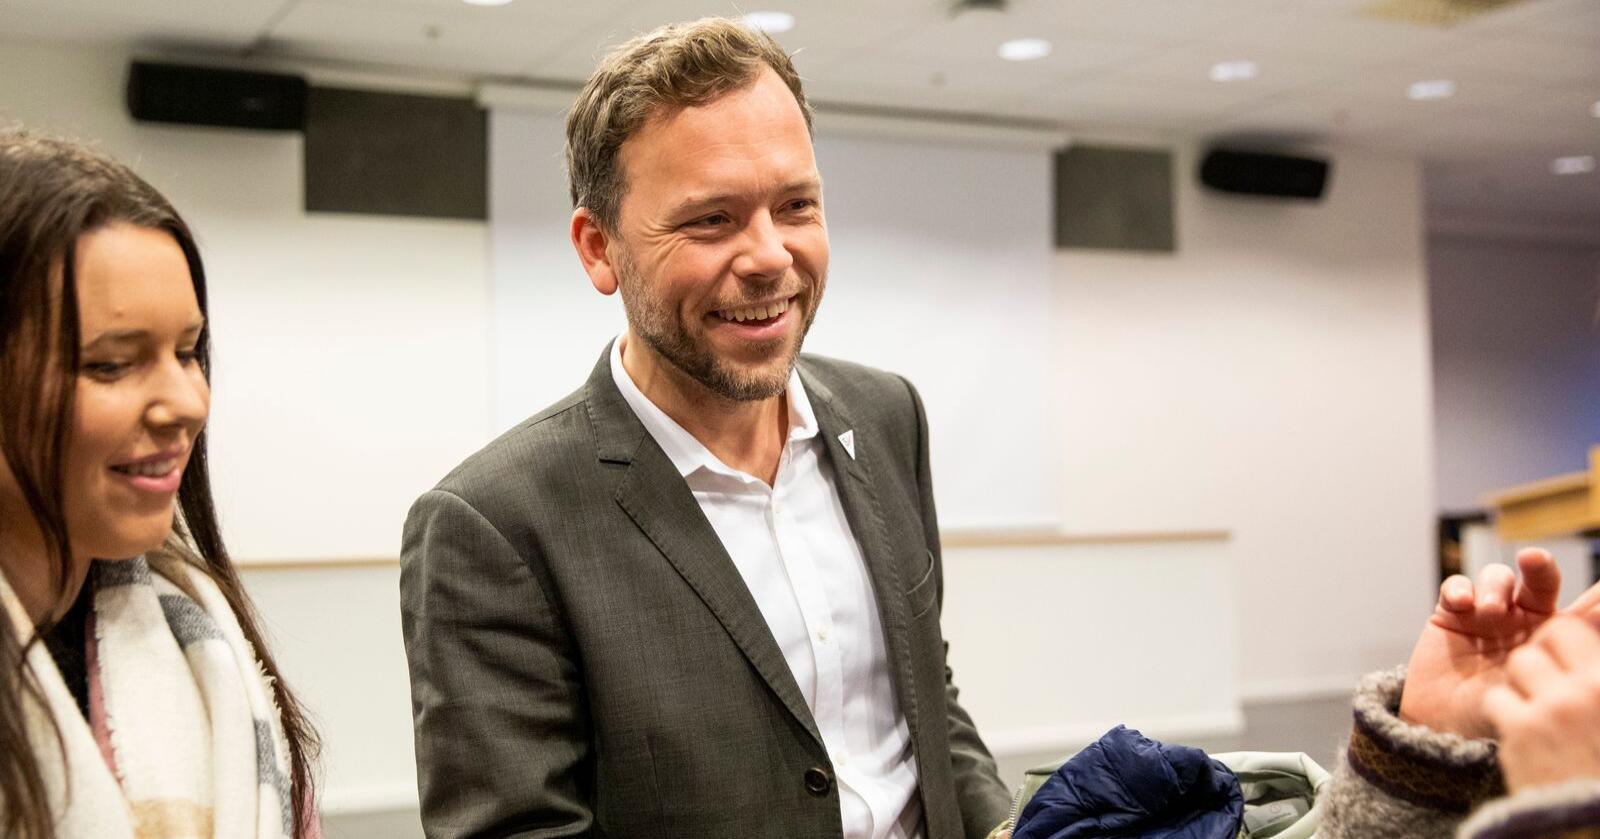 SV-leder Audun Lysbakken under partiets landsstyremøte nylig. Foto: Tore Meek / NTB scanpix